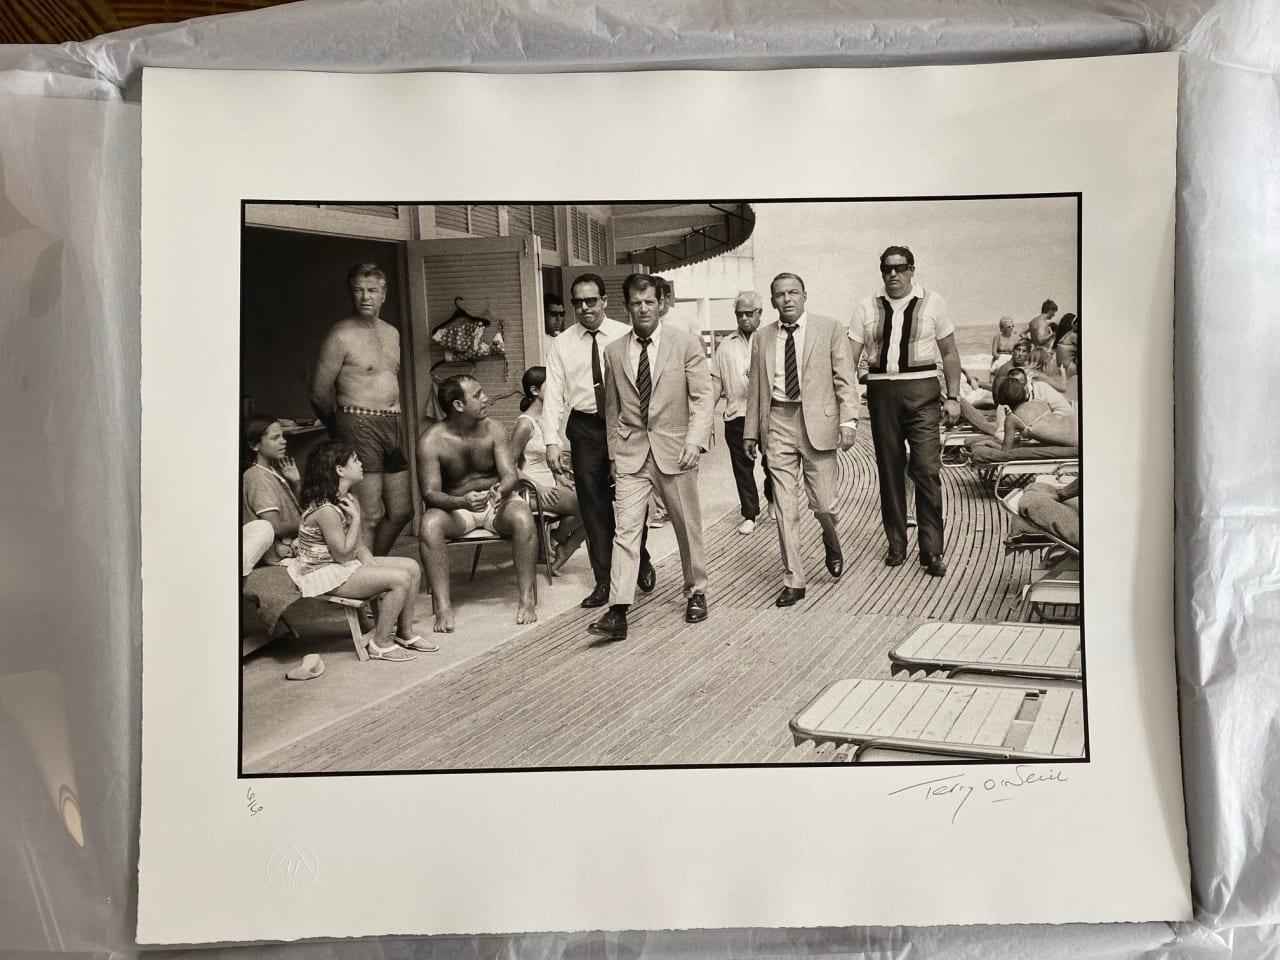 Terry O'Neill, Frank Sinatra on the Boardwalk, 1968